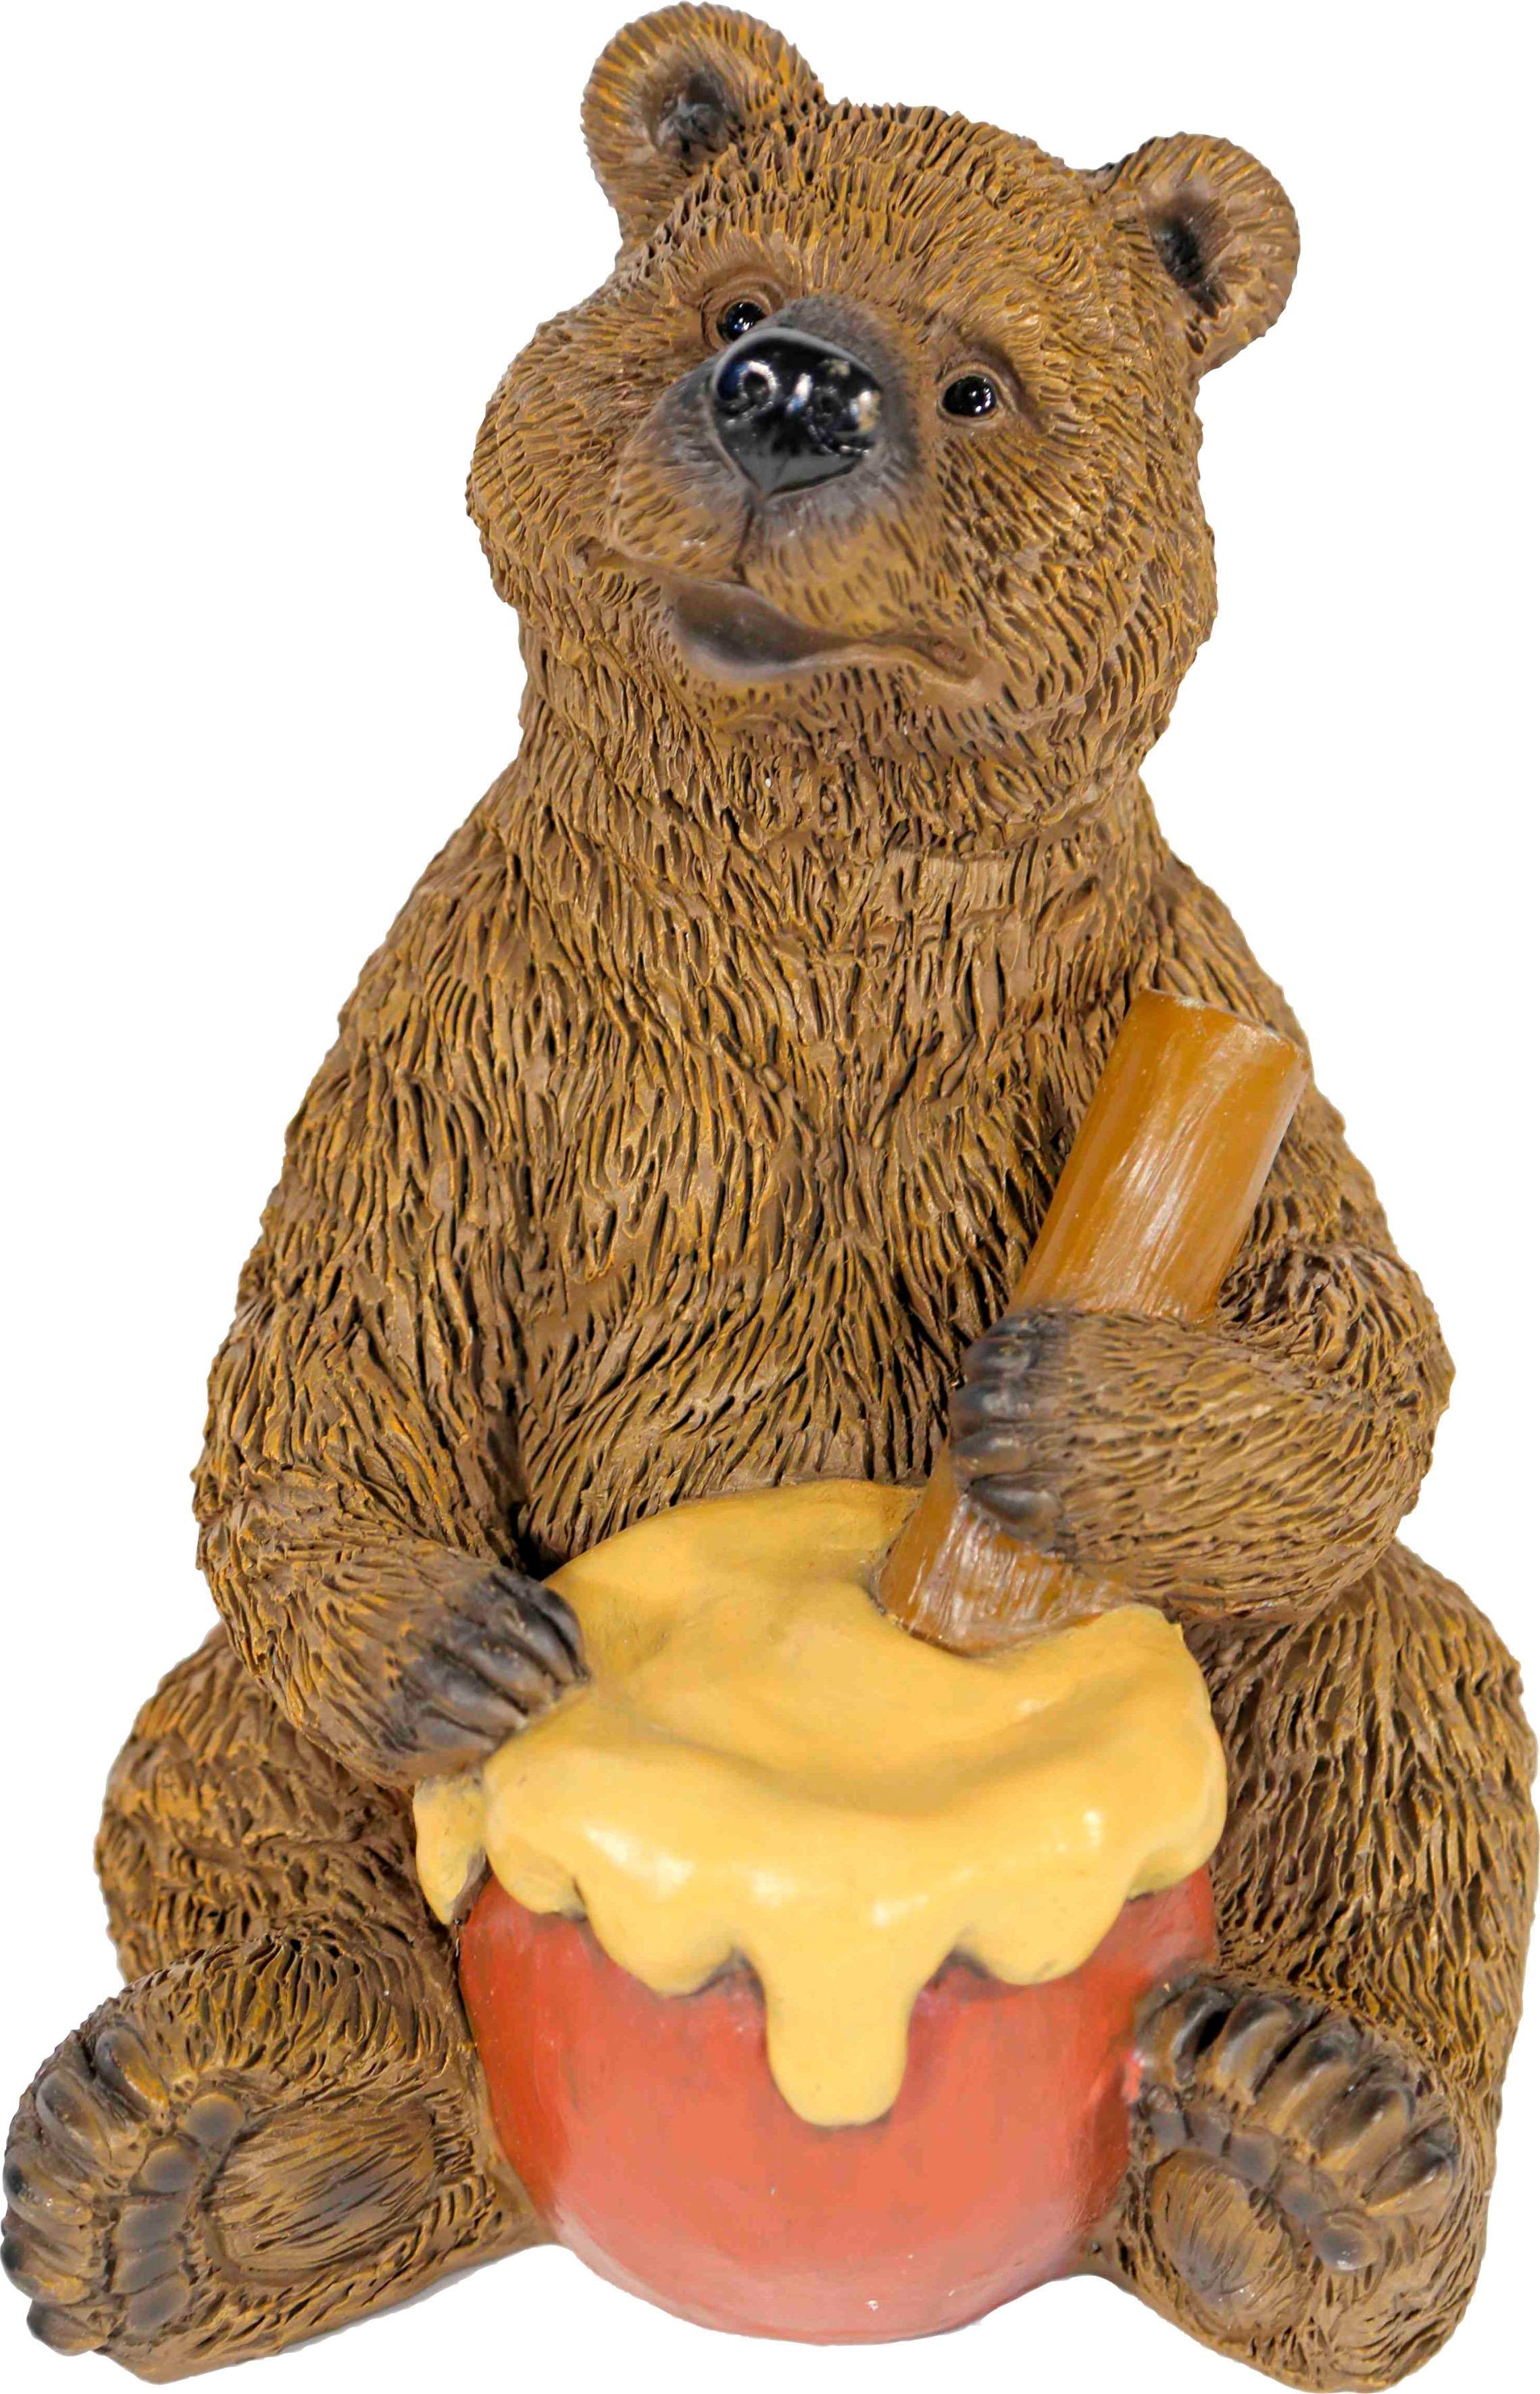 Casa Collection by Jänig Tierfigur, H 32 cm braun Tierfiguren Figuren Skulpturen Wohnaccessoires Tierfigur